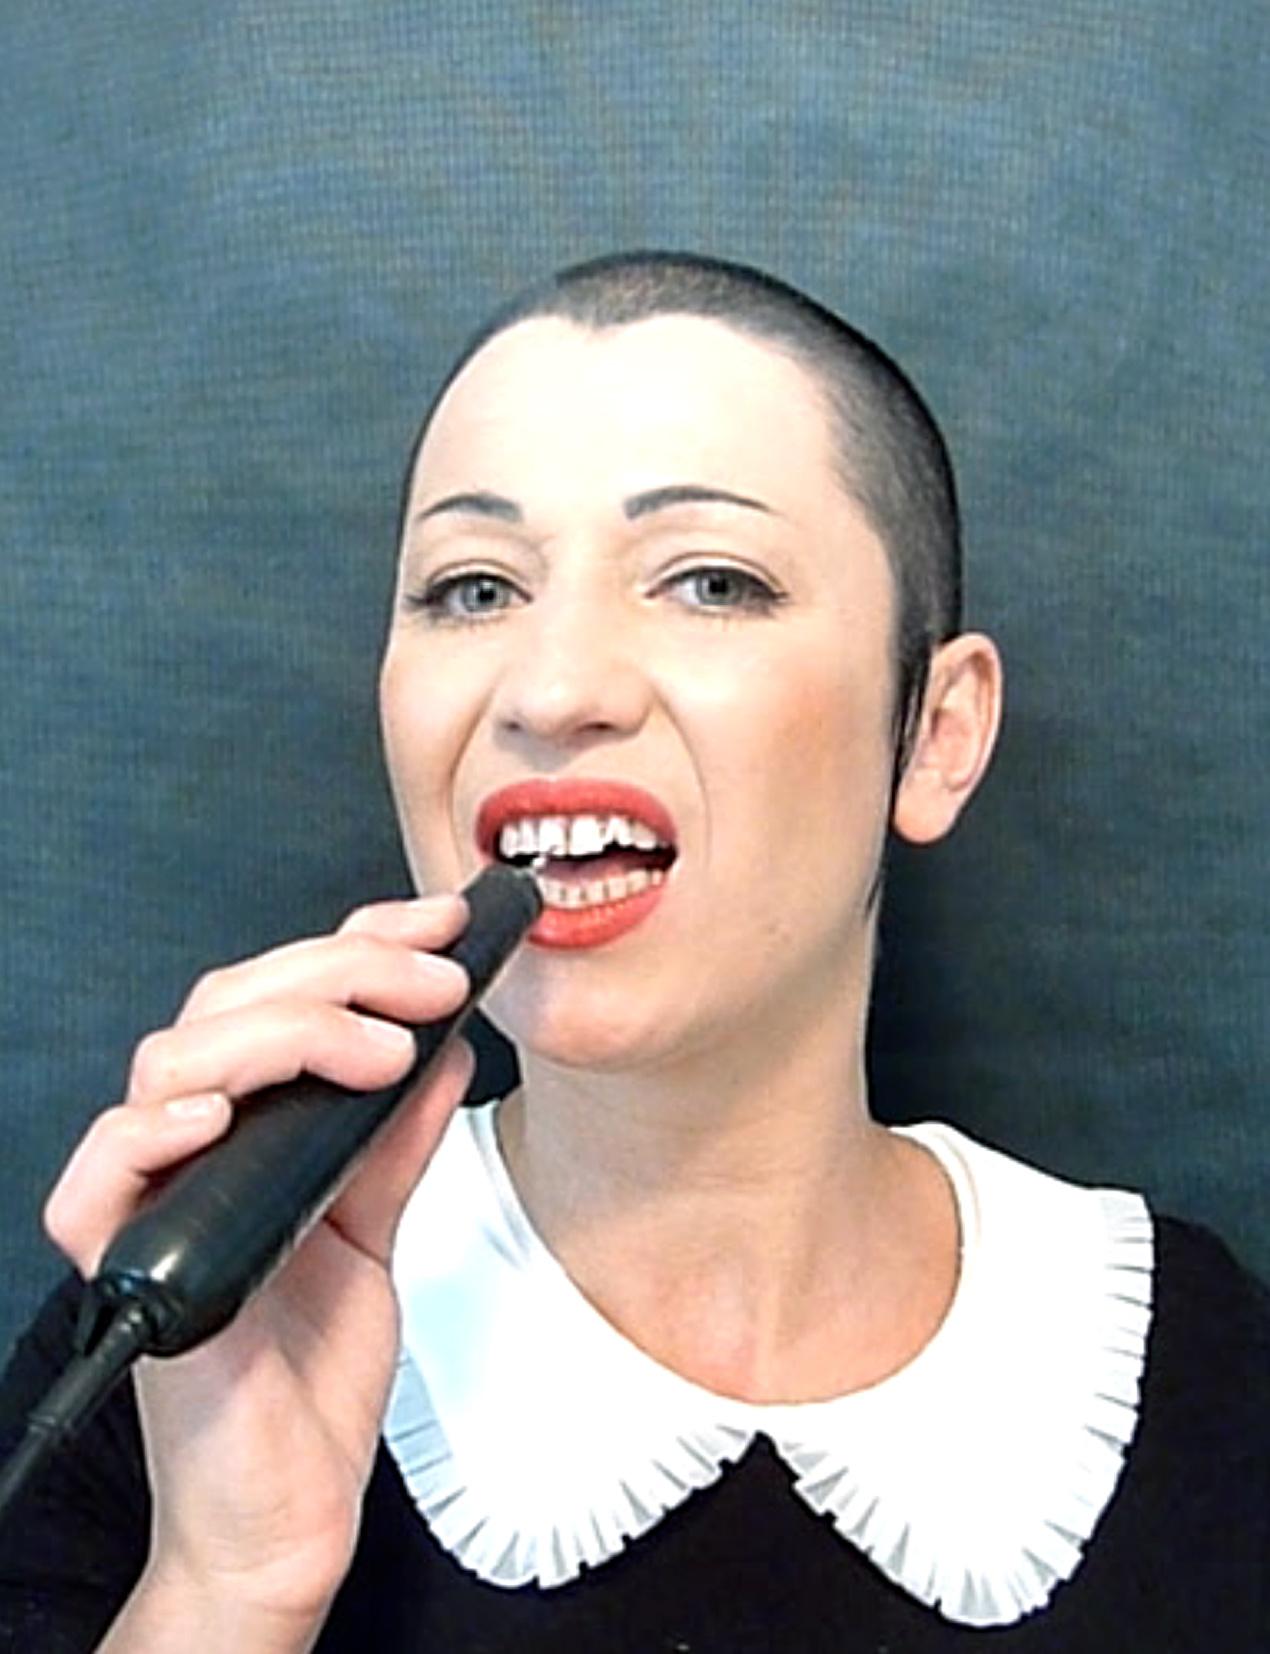 Aleksandra Ska, Bezproduktywna, video, 2011